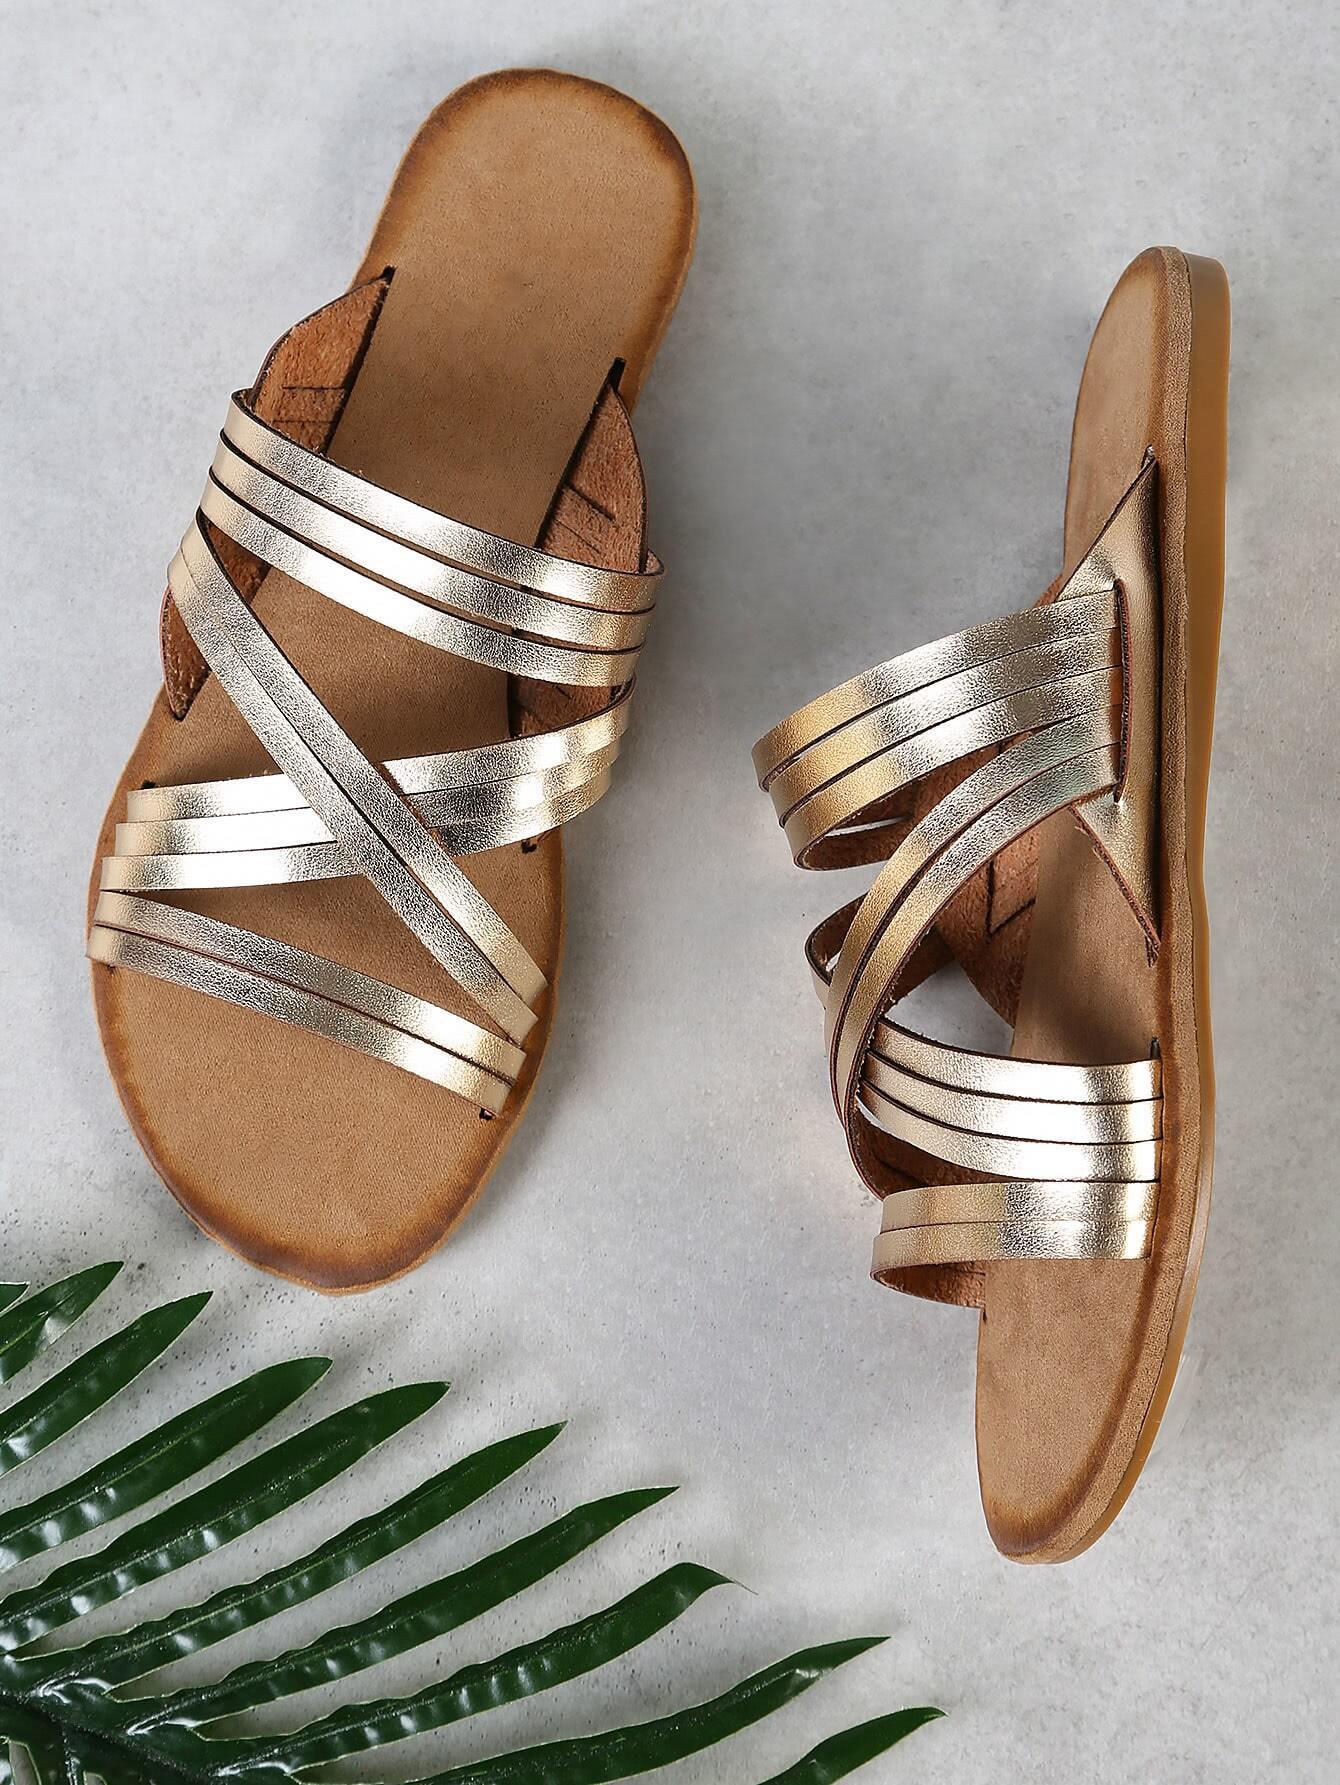 Criss Cross Strappy Band Slide Sandal GOLD double band slide sandal black